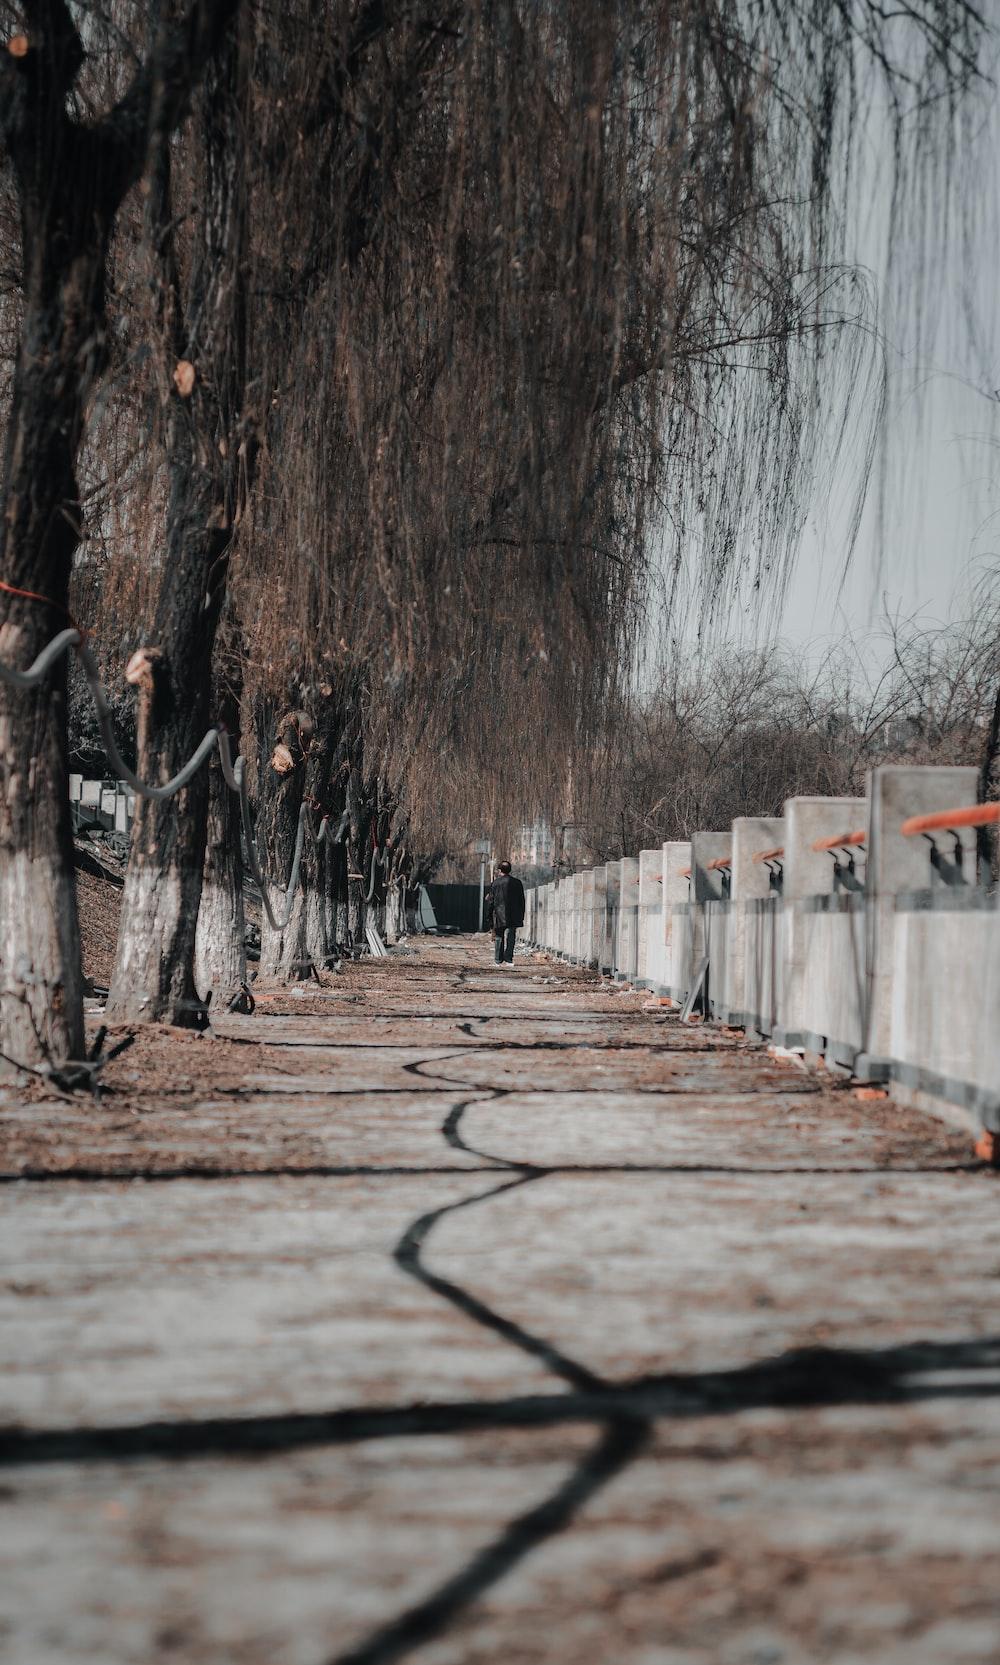 person in black jacket walking on wooden bridge during daytime